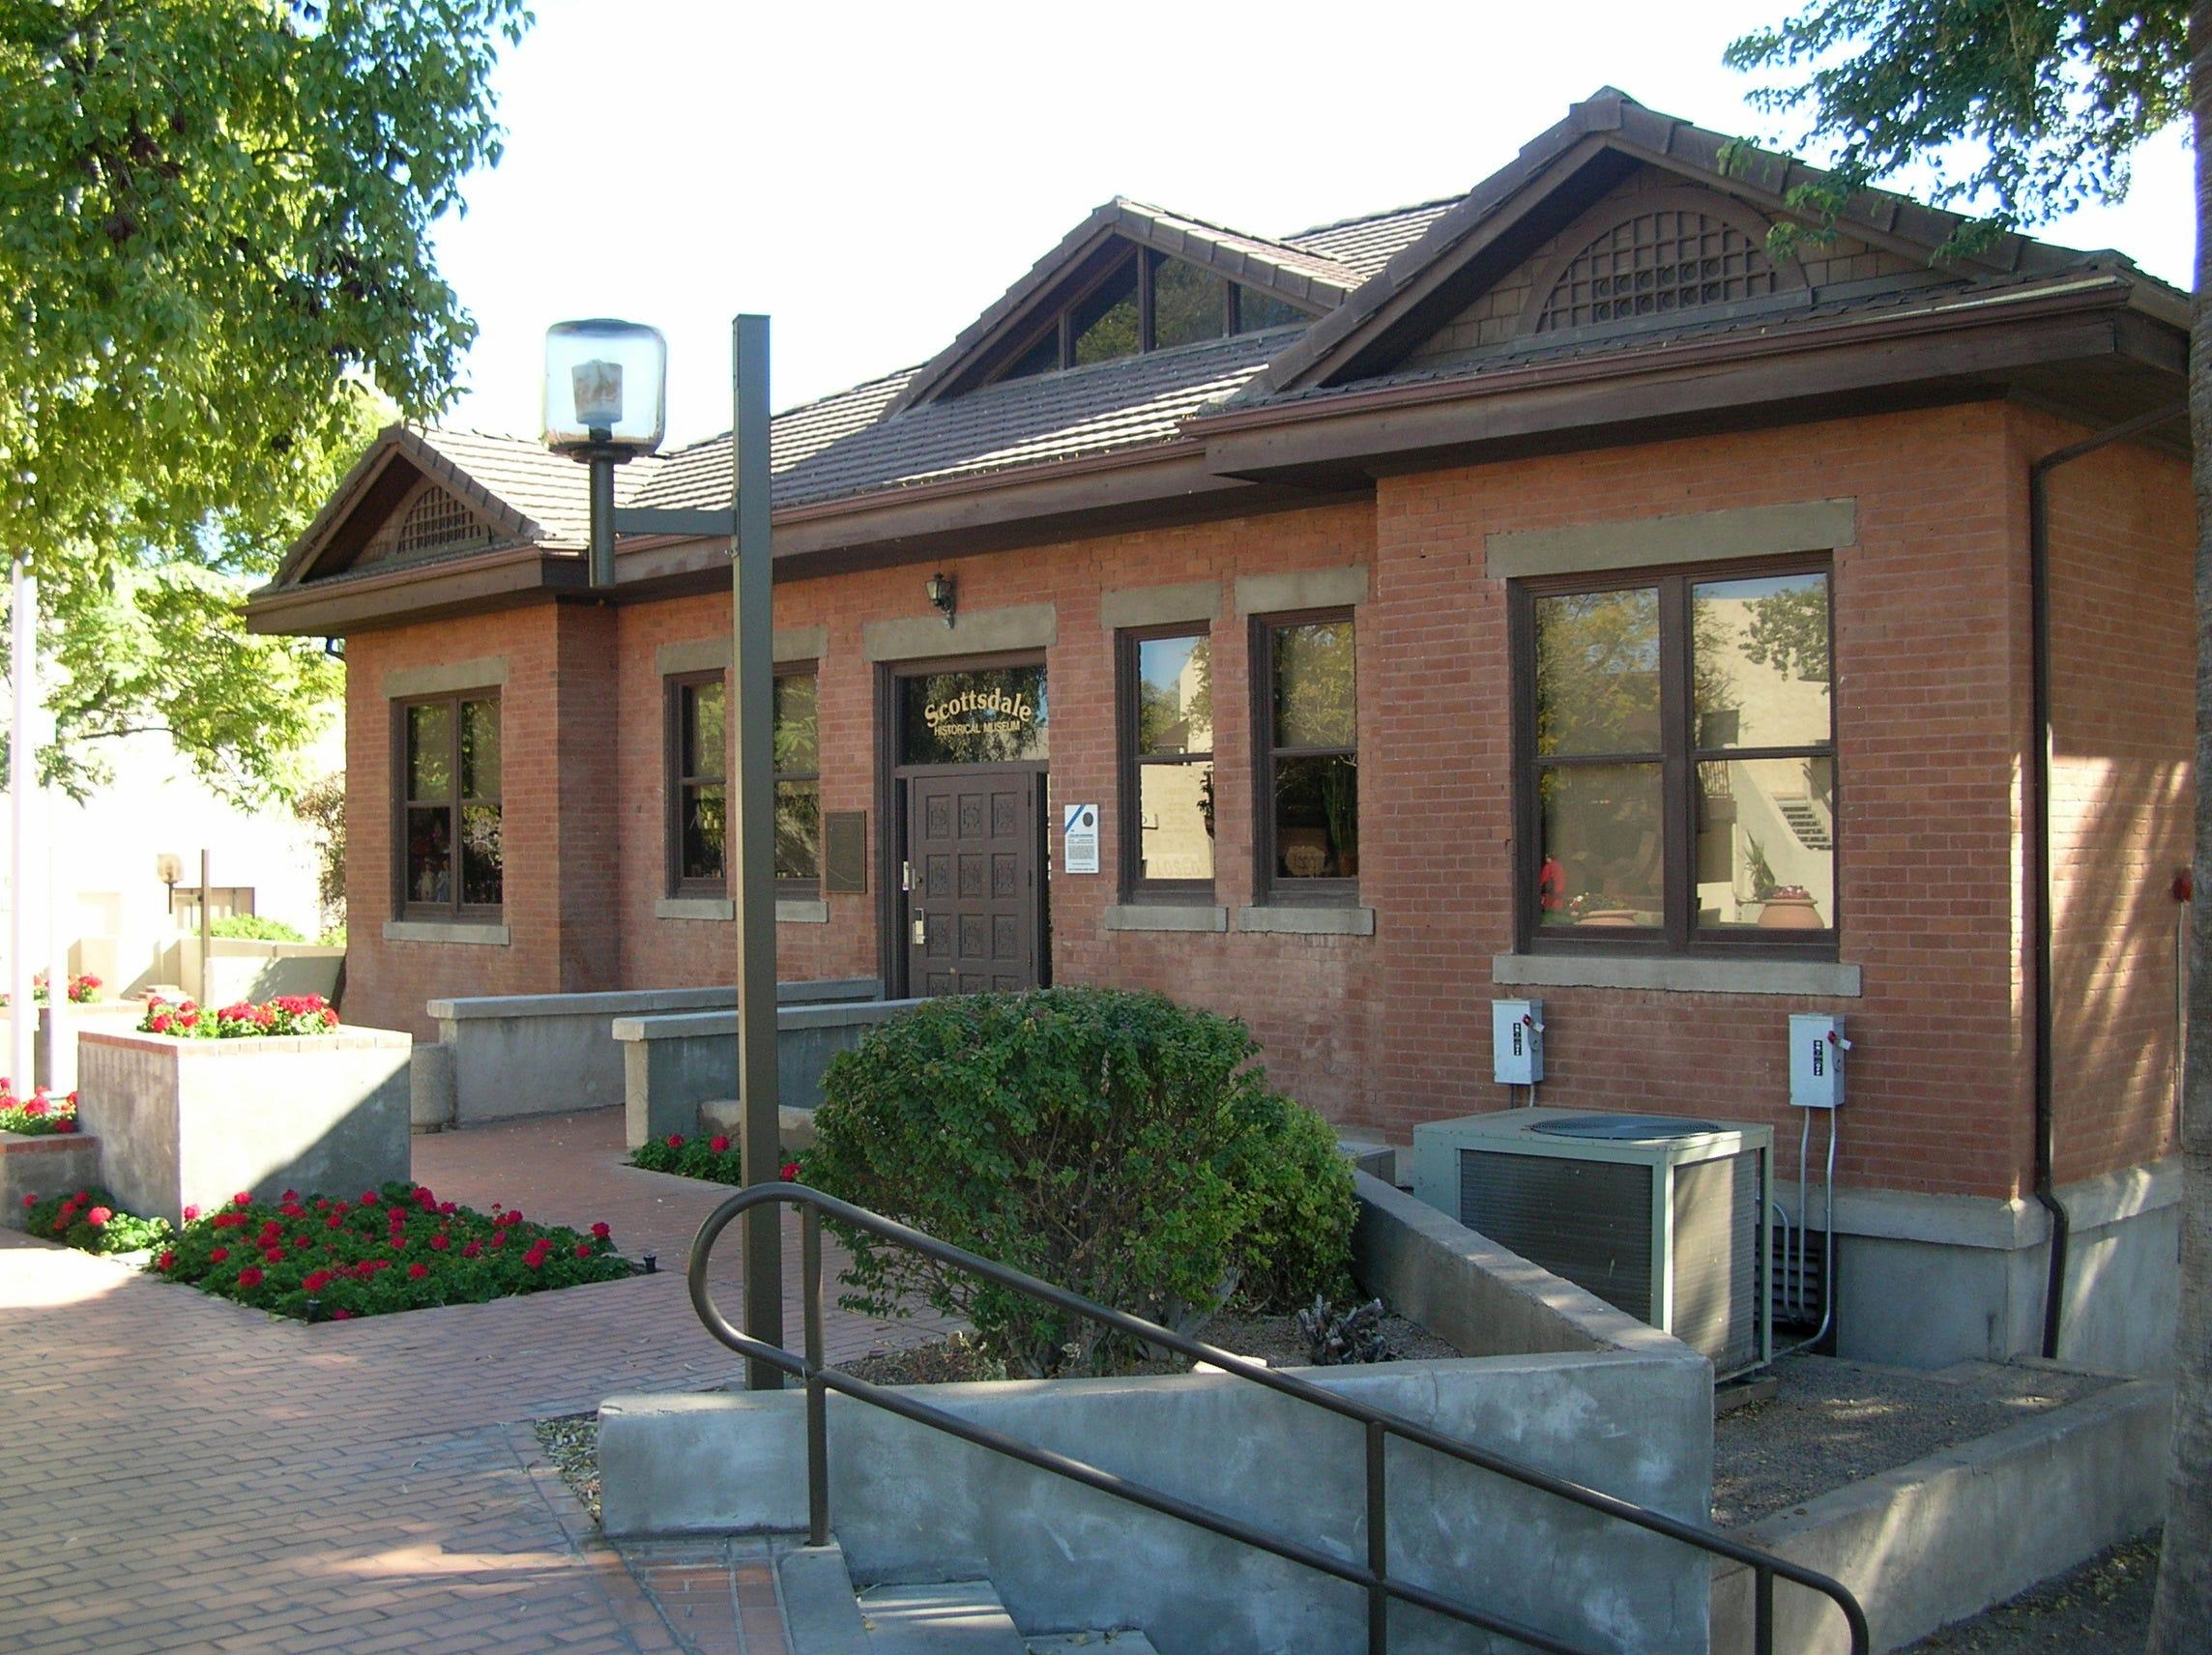 Little Red School House, built in 1910, is a Scottsdale landmark | AZ Central